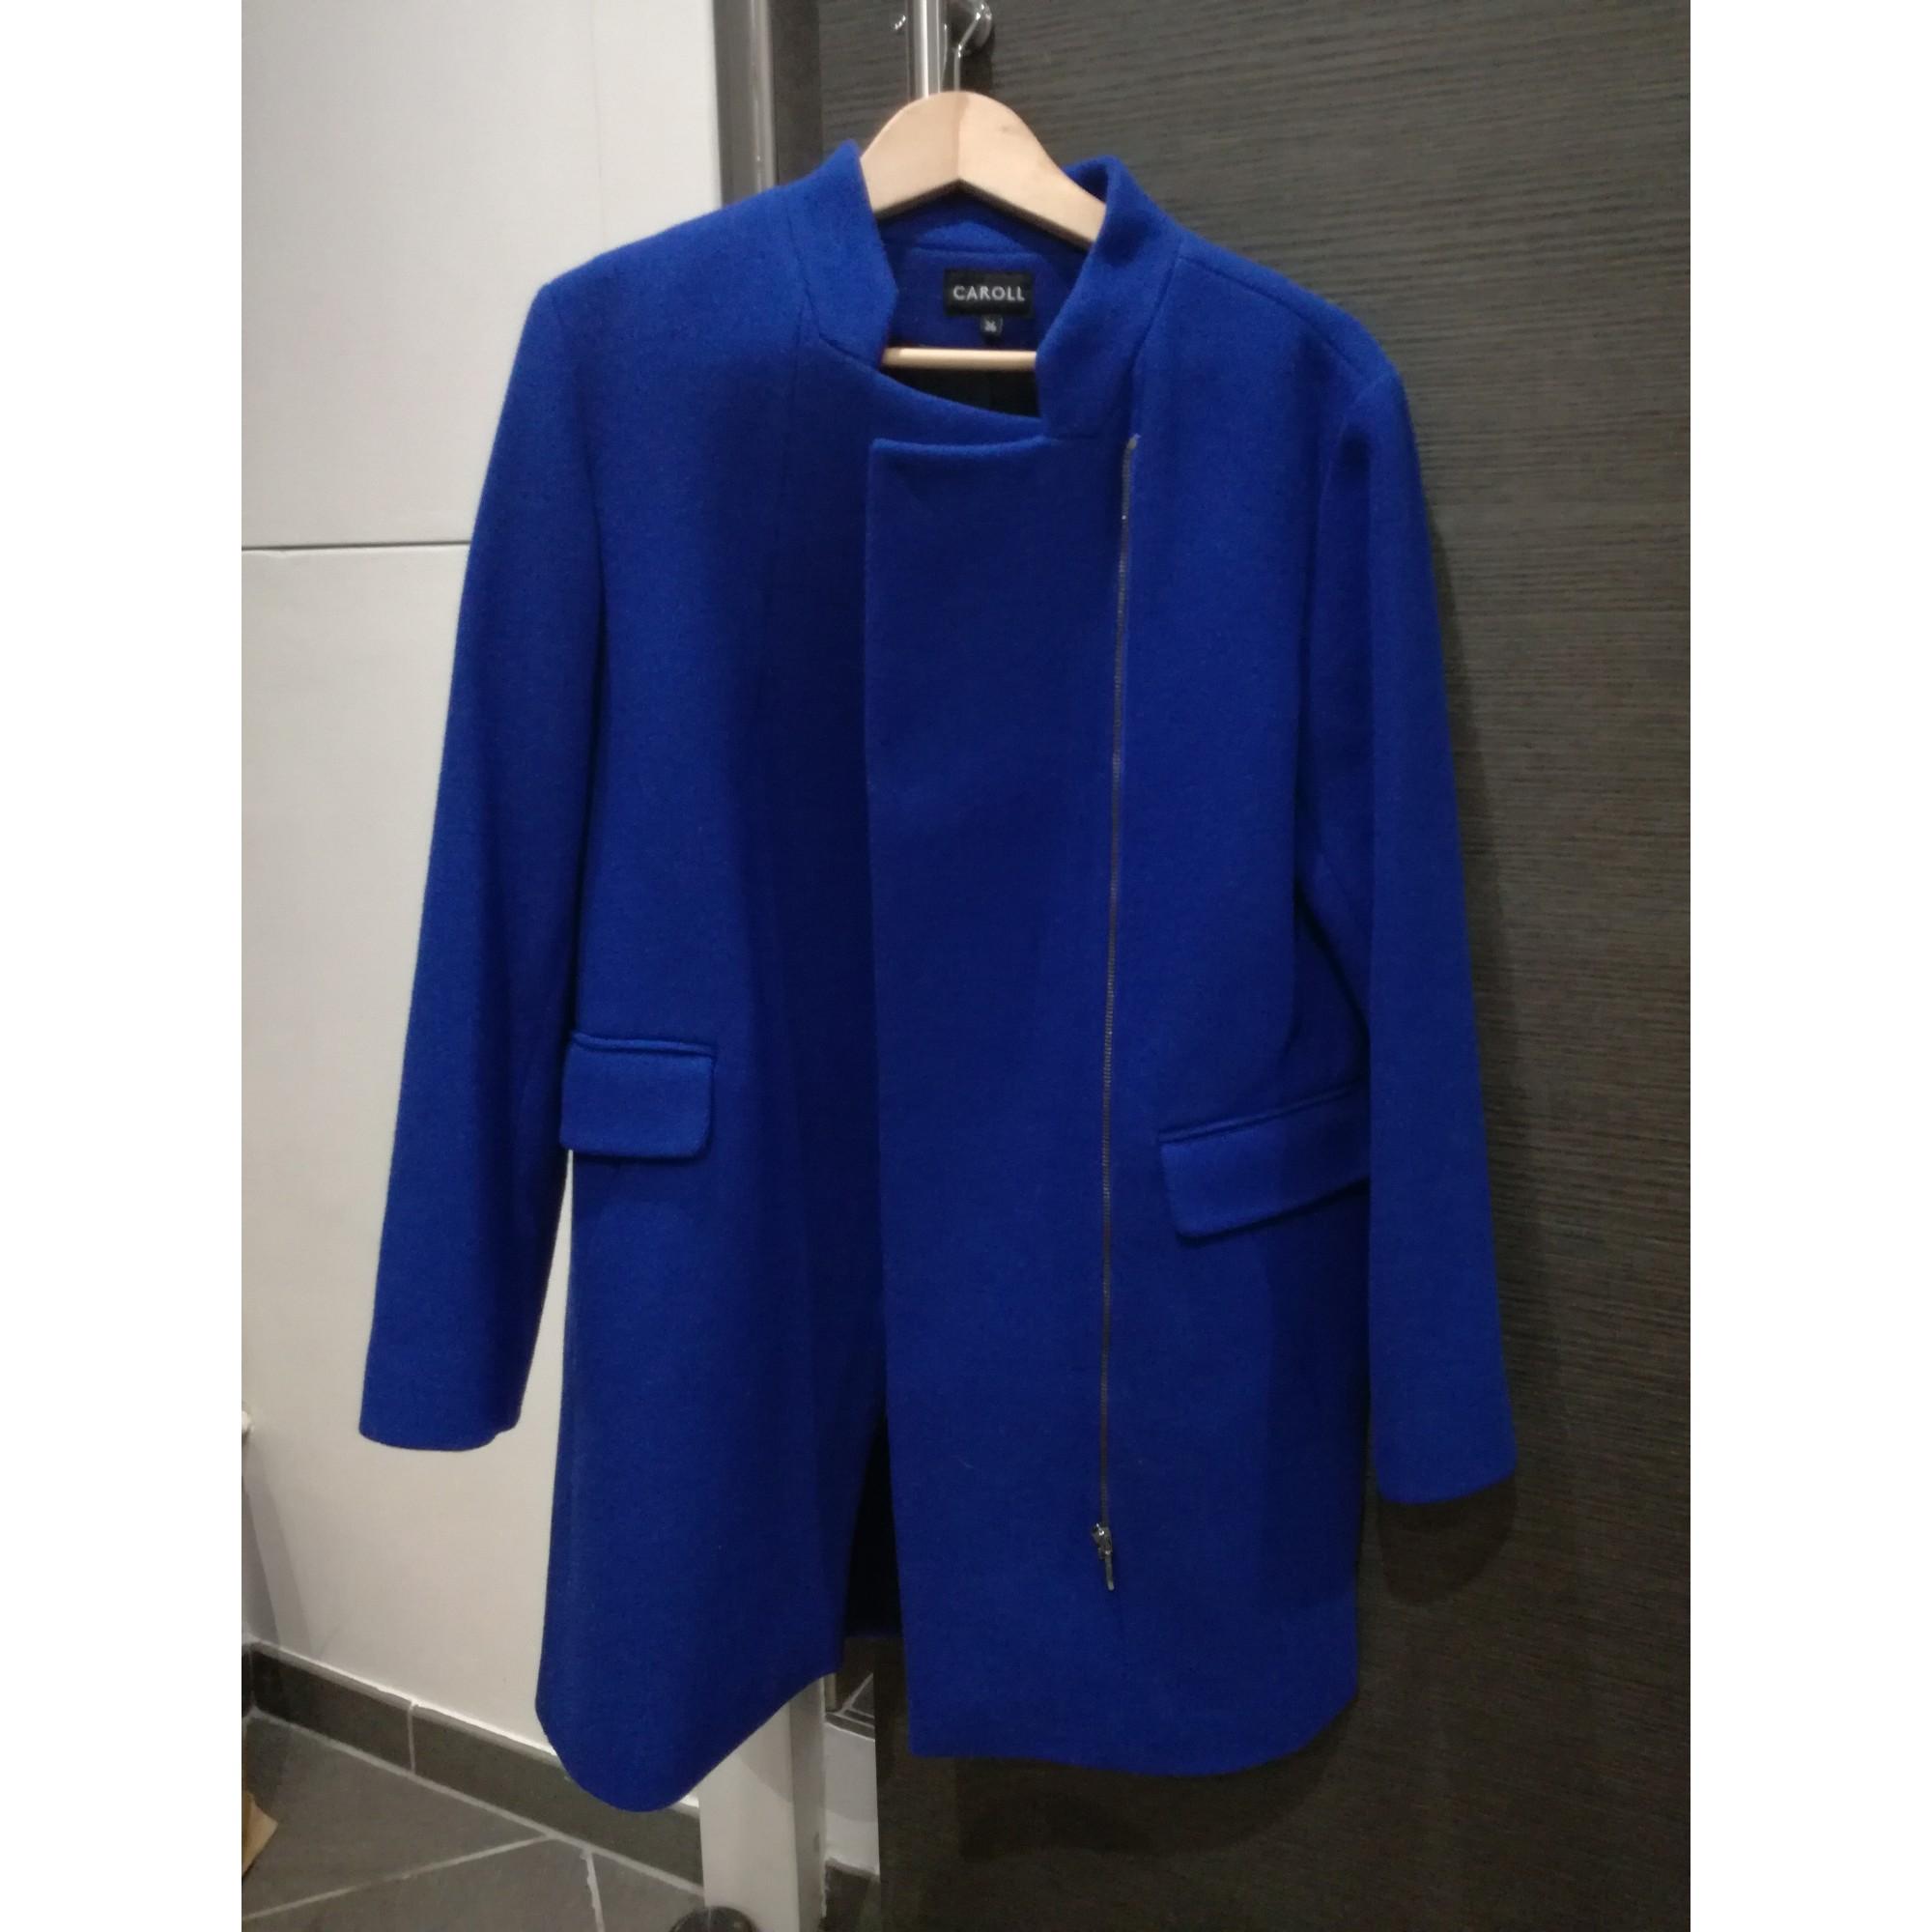 Manteau CAROLL 36 (S, T1) bleu 7008438